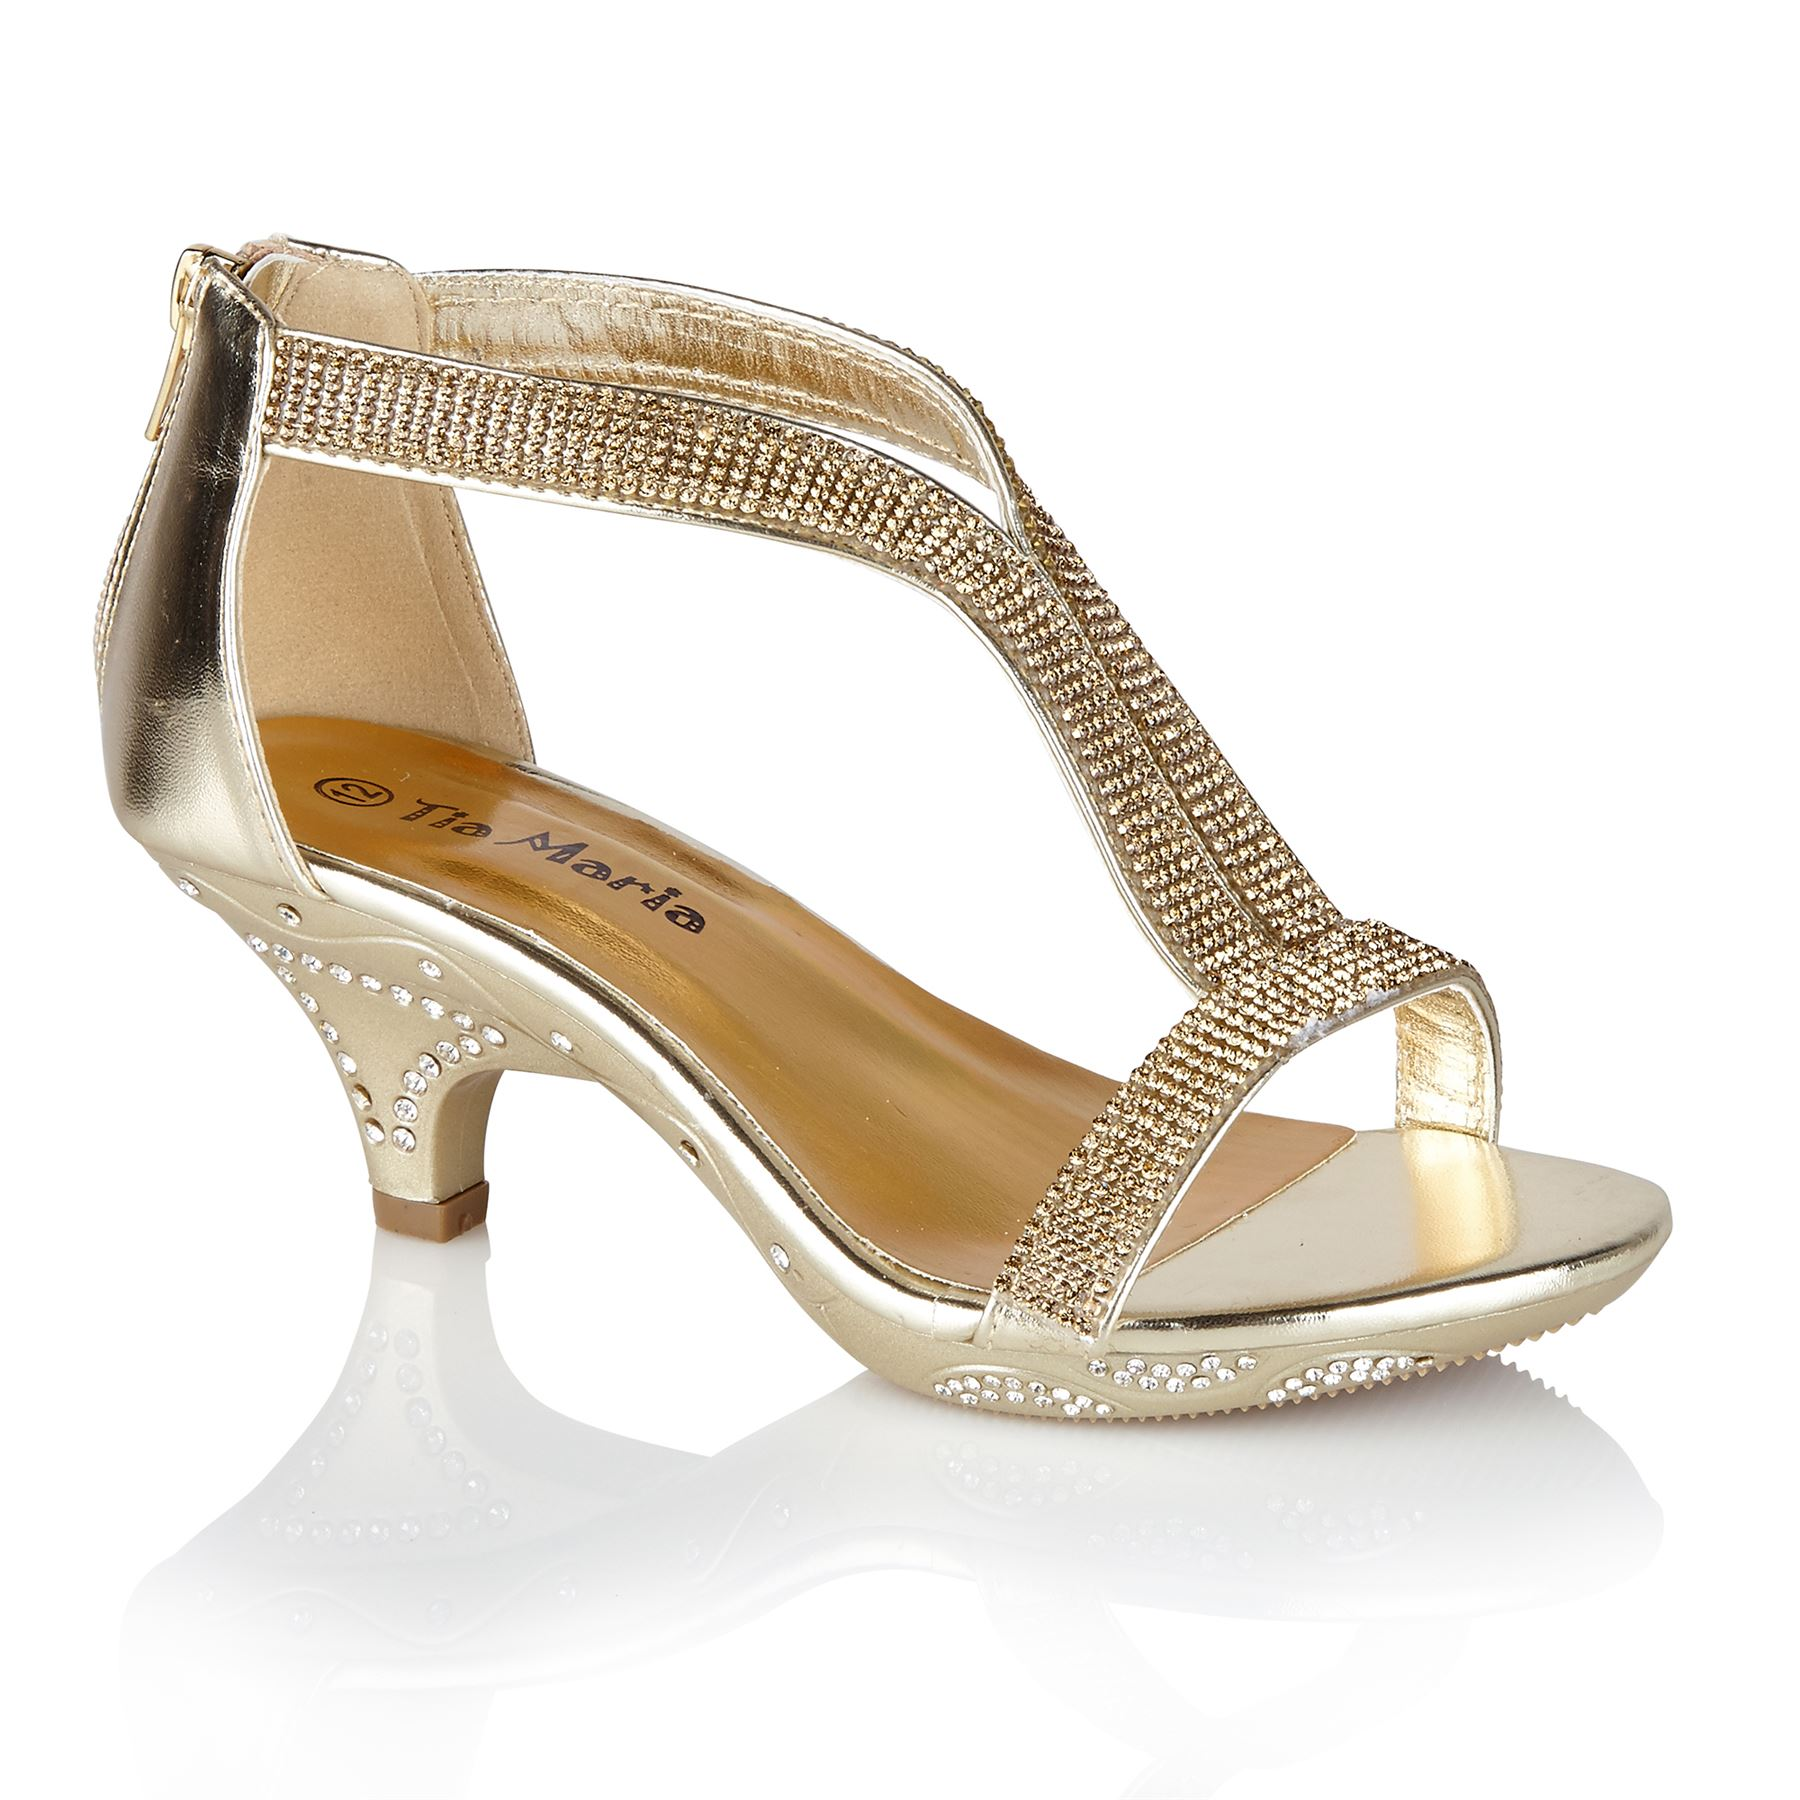 14 Tia Maria Girls Mid Heel Diamante Sandals Children/'s Party Kids Shoes